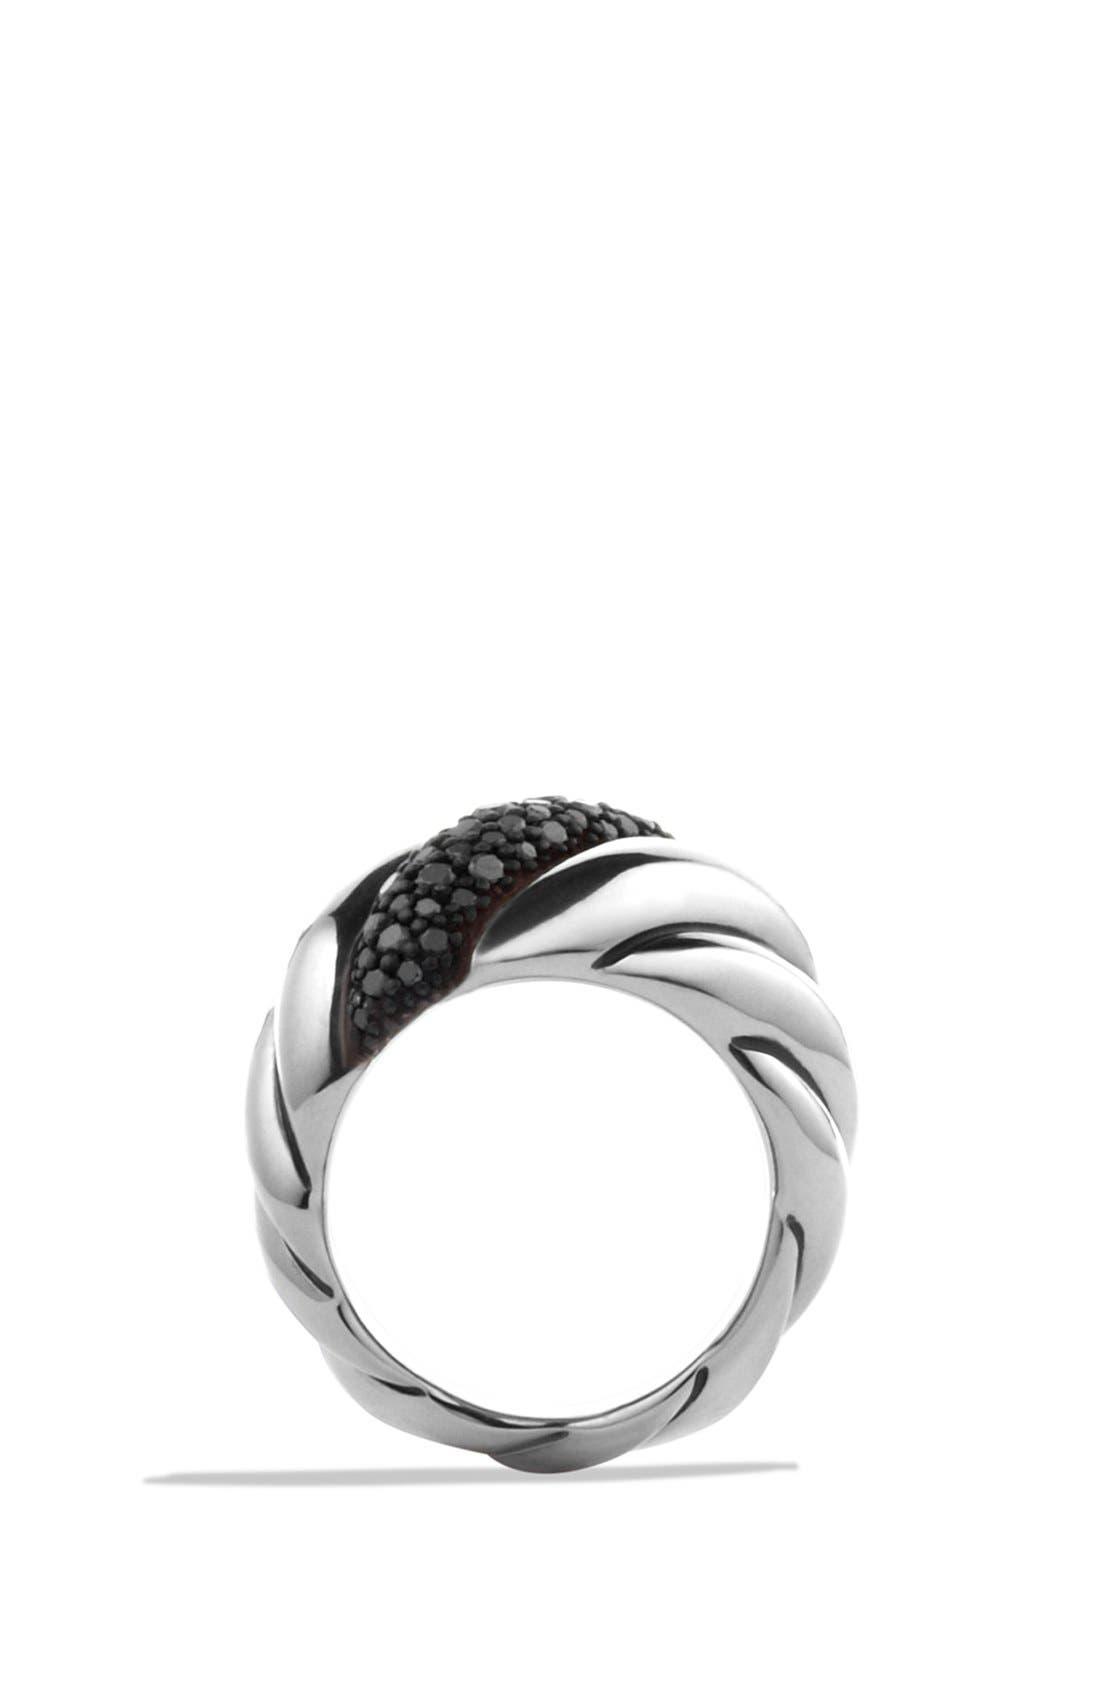 Alternate Image 2  - David Yurman 'Hampton Cable' Ring with Gray Diamonds and Blue Sapphires